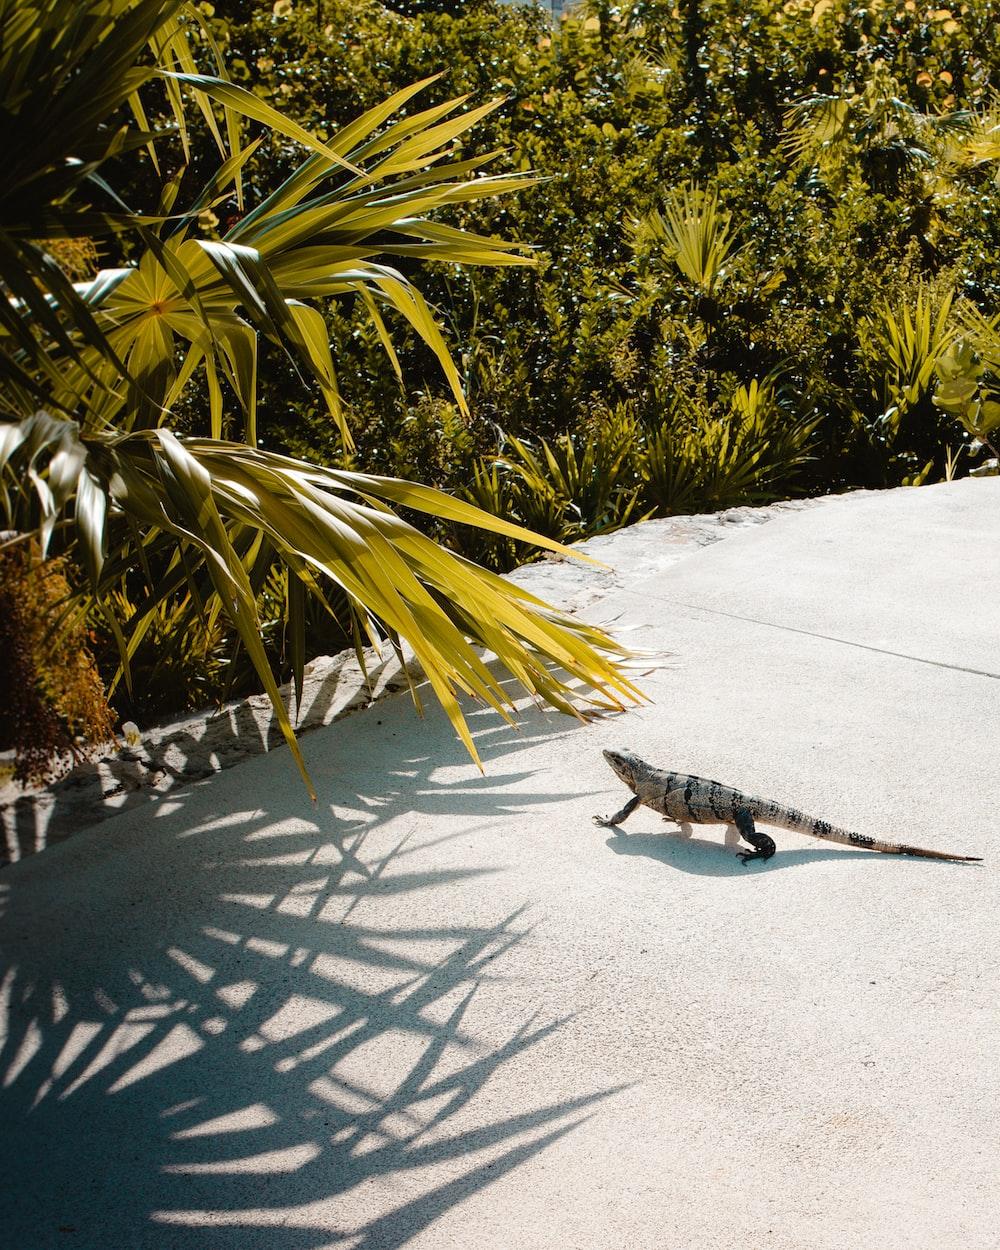 brown and gray iguana walking